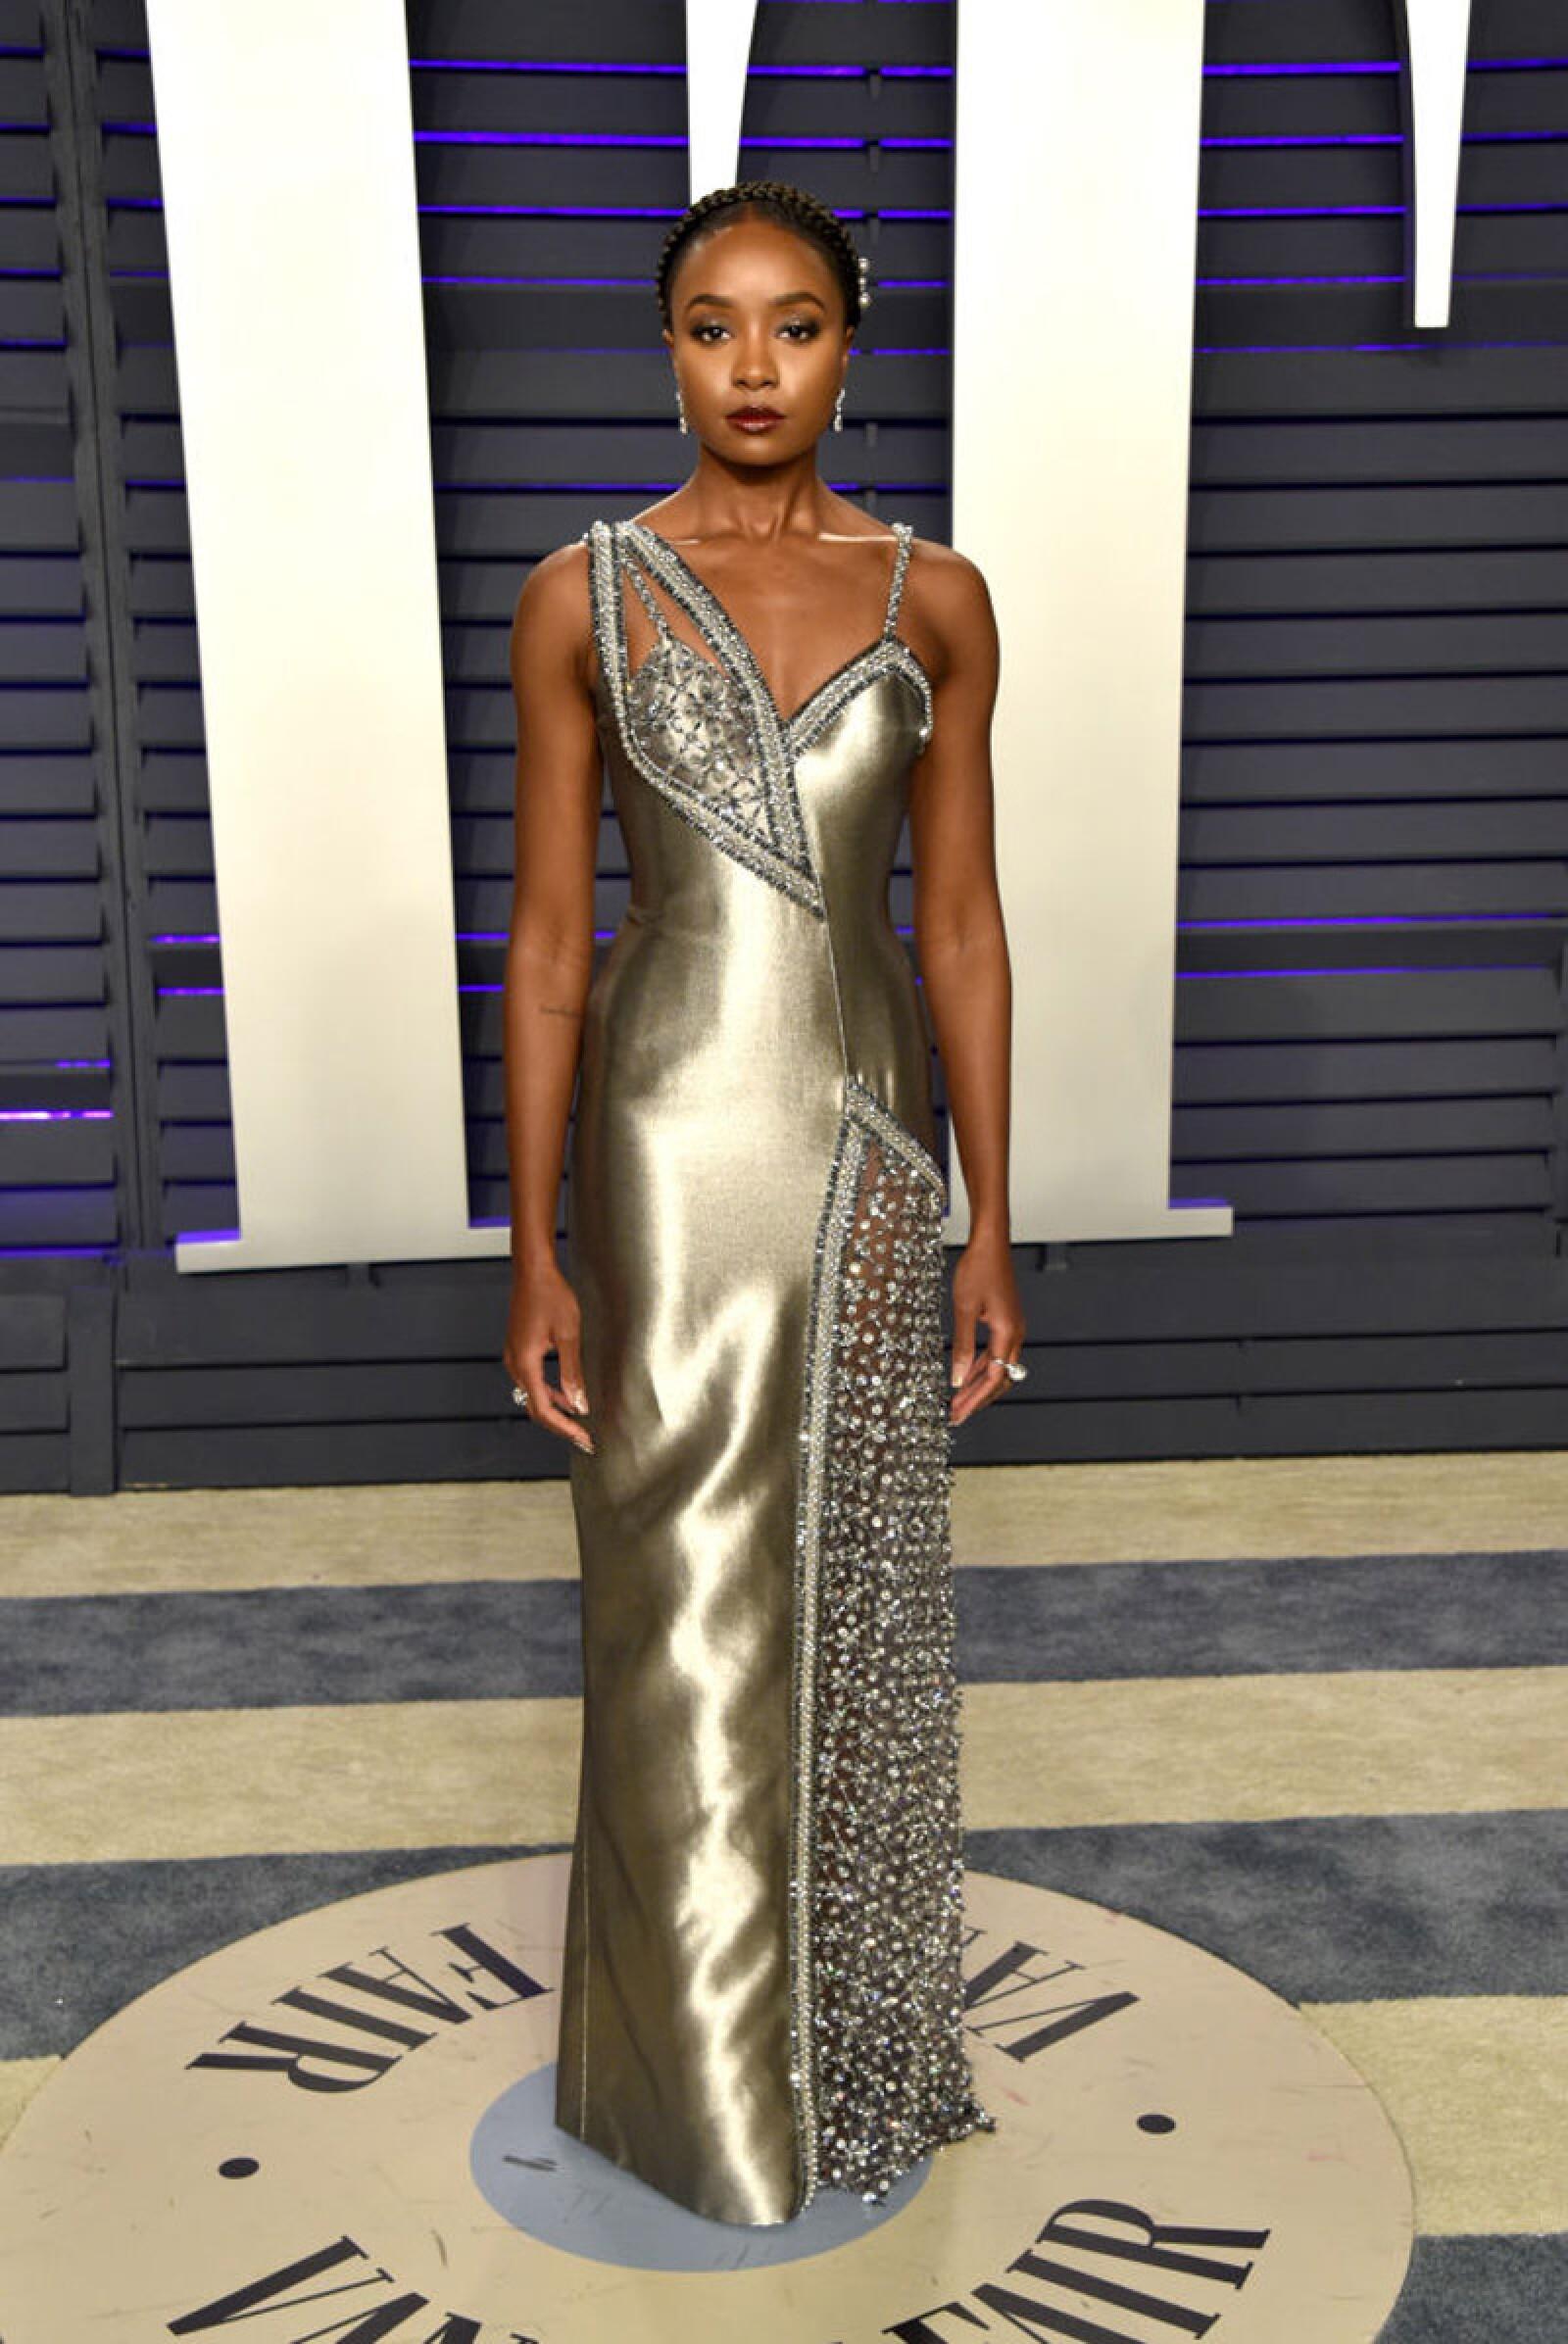 2019 Vanity Fair Oscar Party Hosted By Radhika Jones - Arrivals